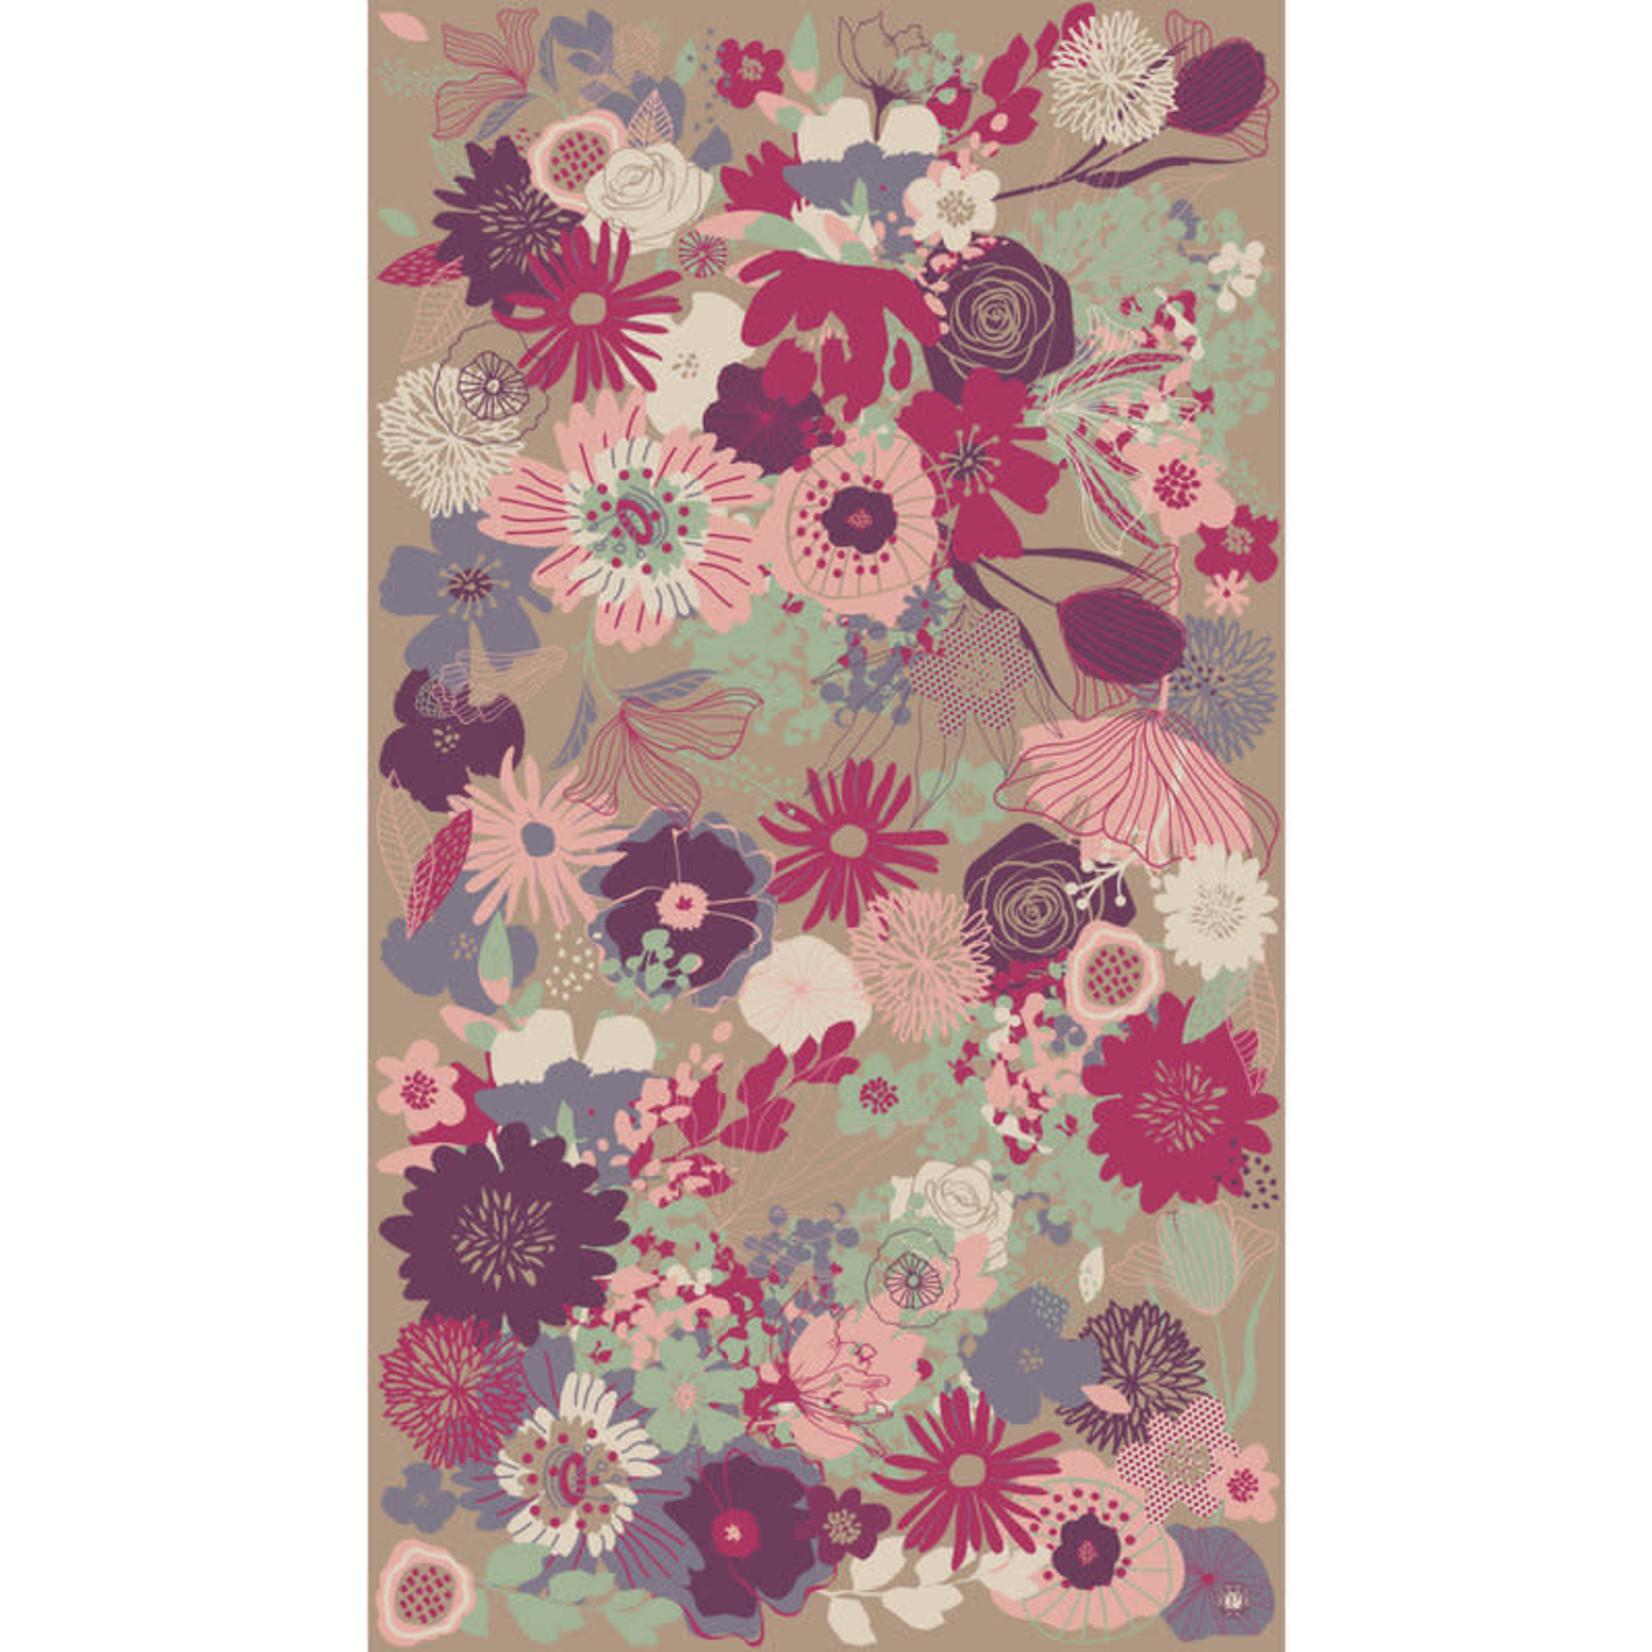 Powder Modern Floral Print Scarf Stone